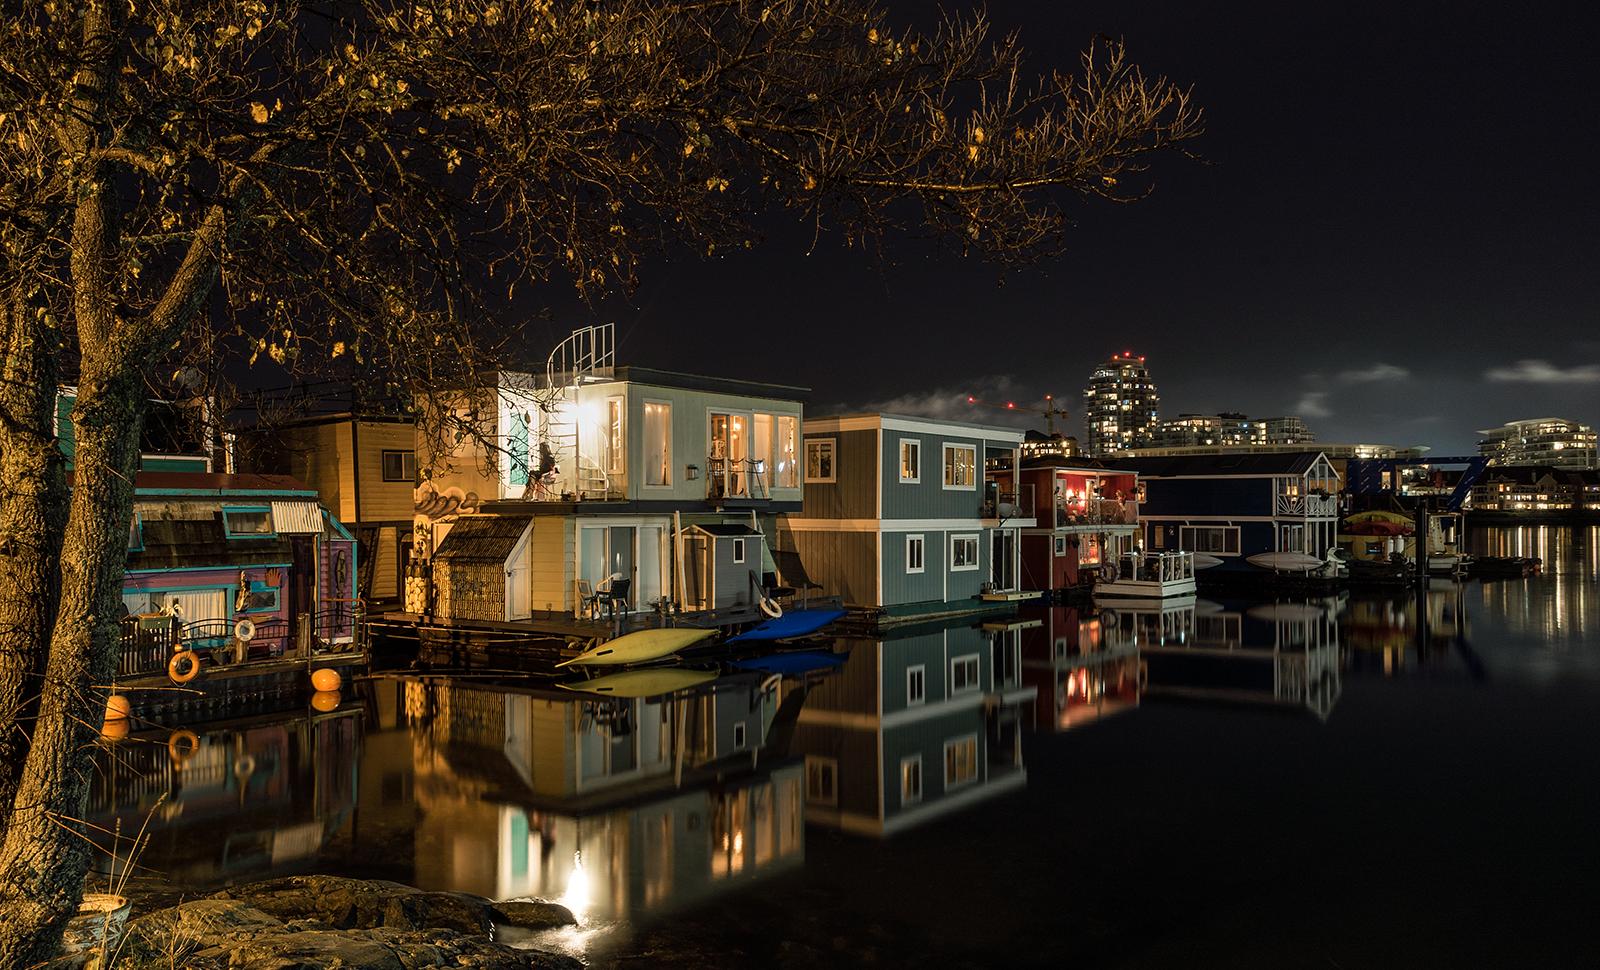 Fishermen's Pier Boathouses